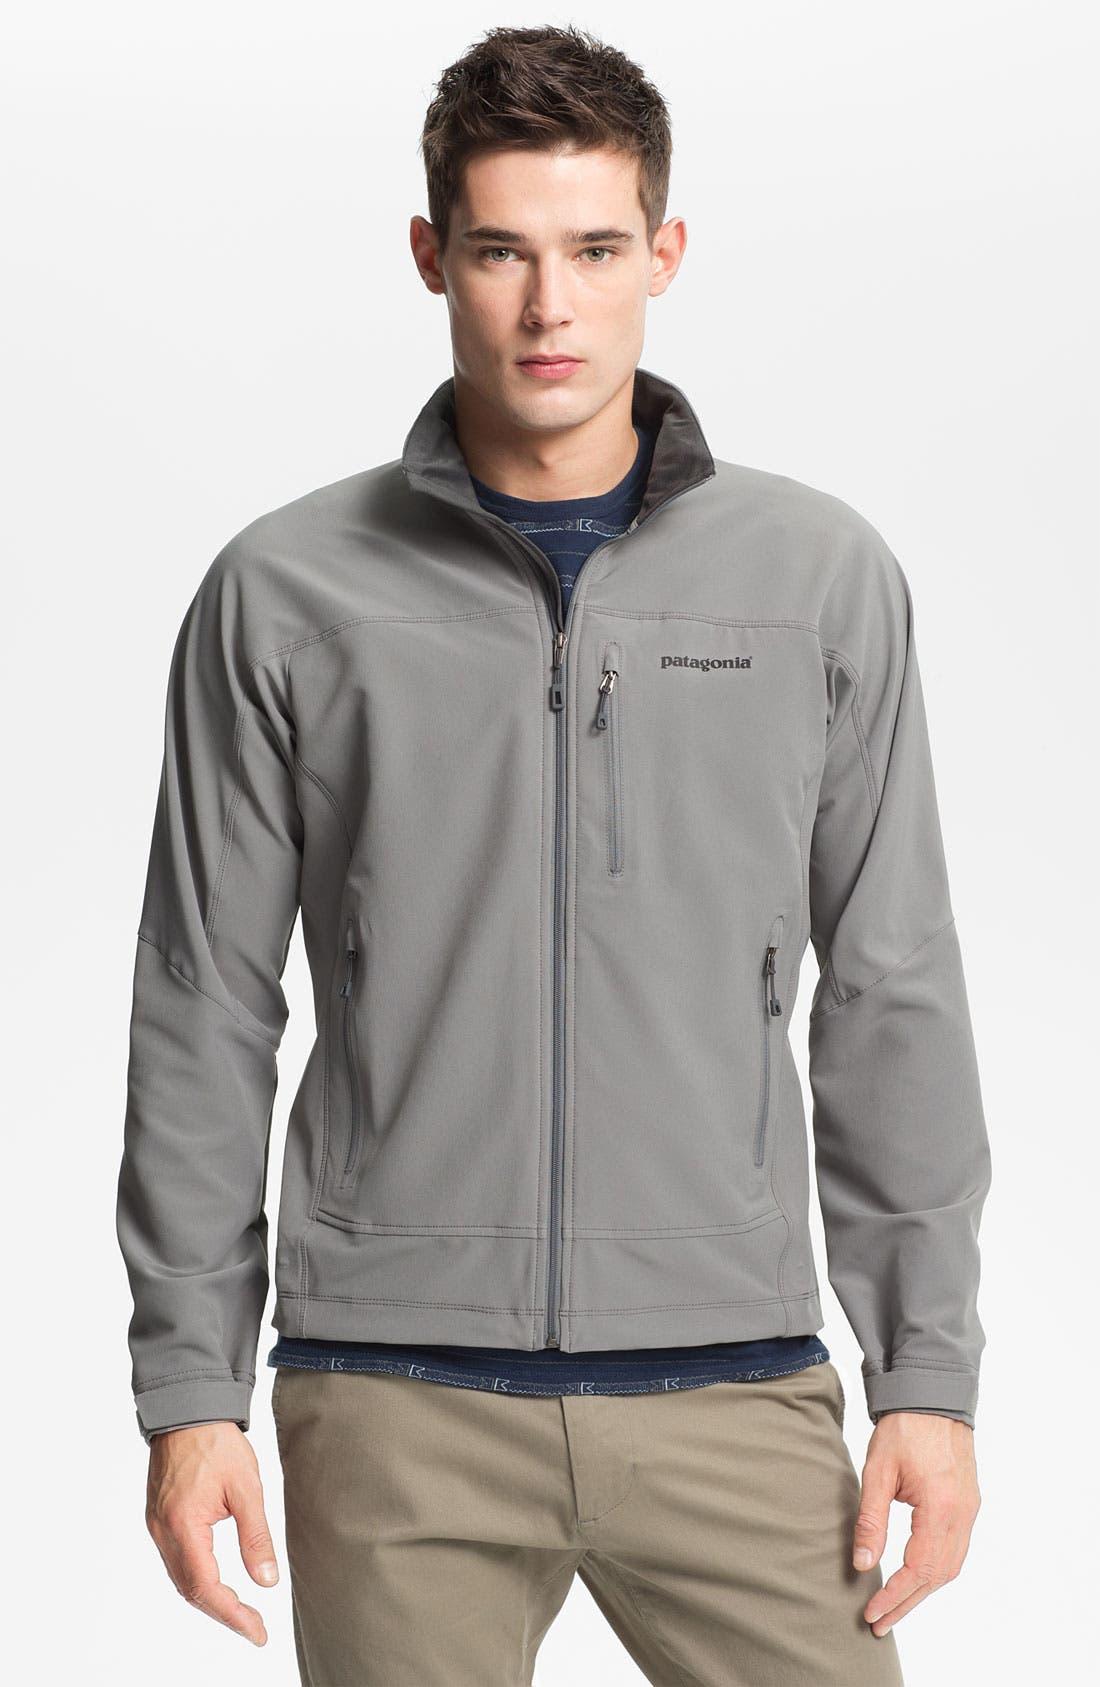 Alternate Image 1 Selected - Patagonia 'Simple Guide' Lightweight Jacket